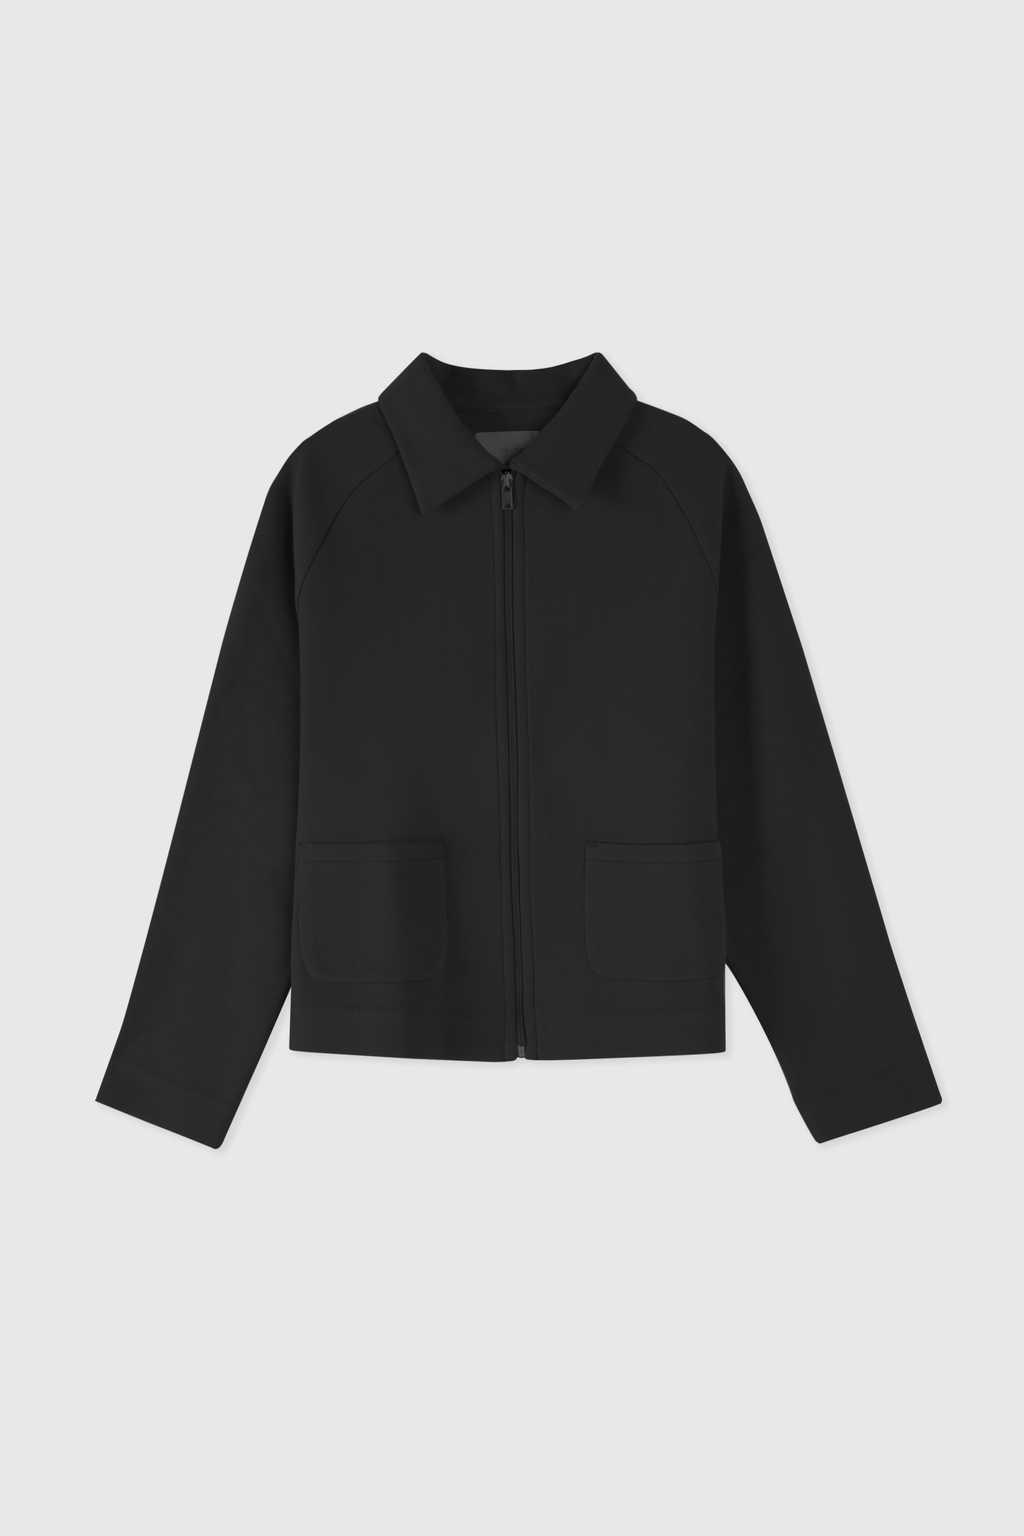 Jacket 2875 Black 13